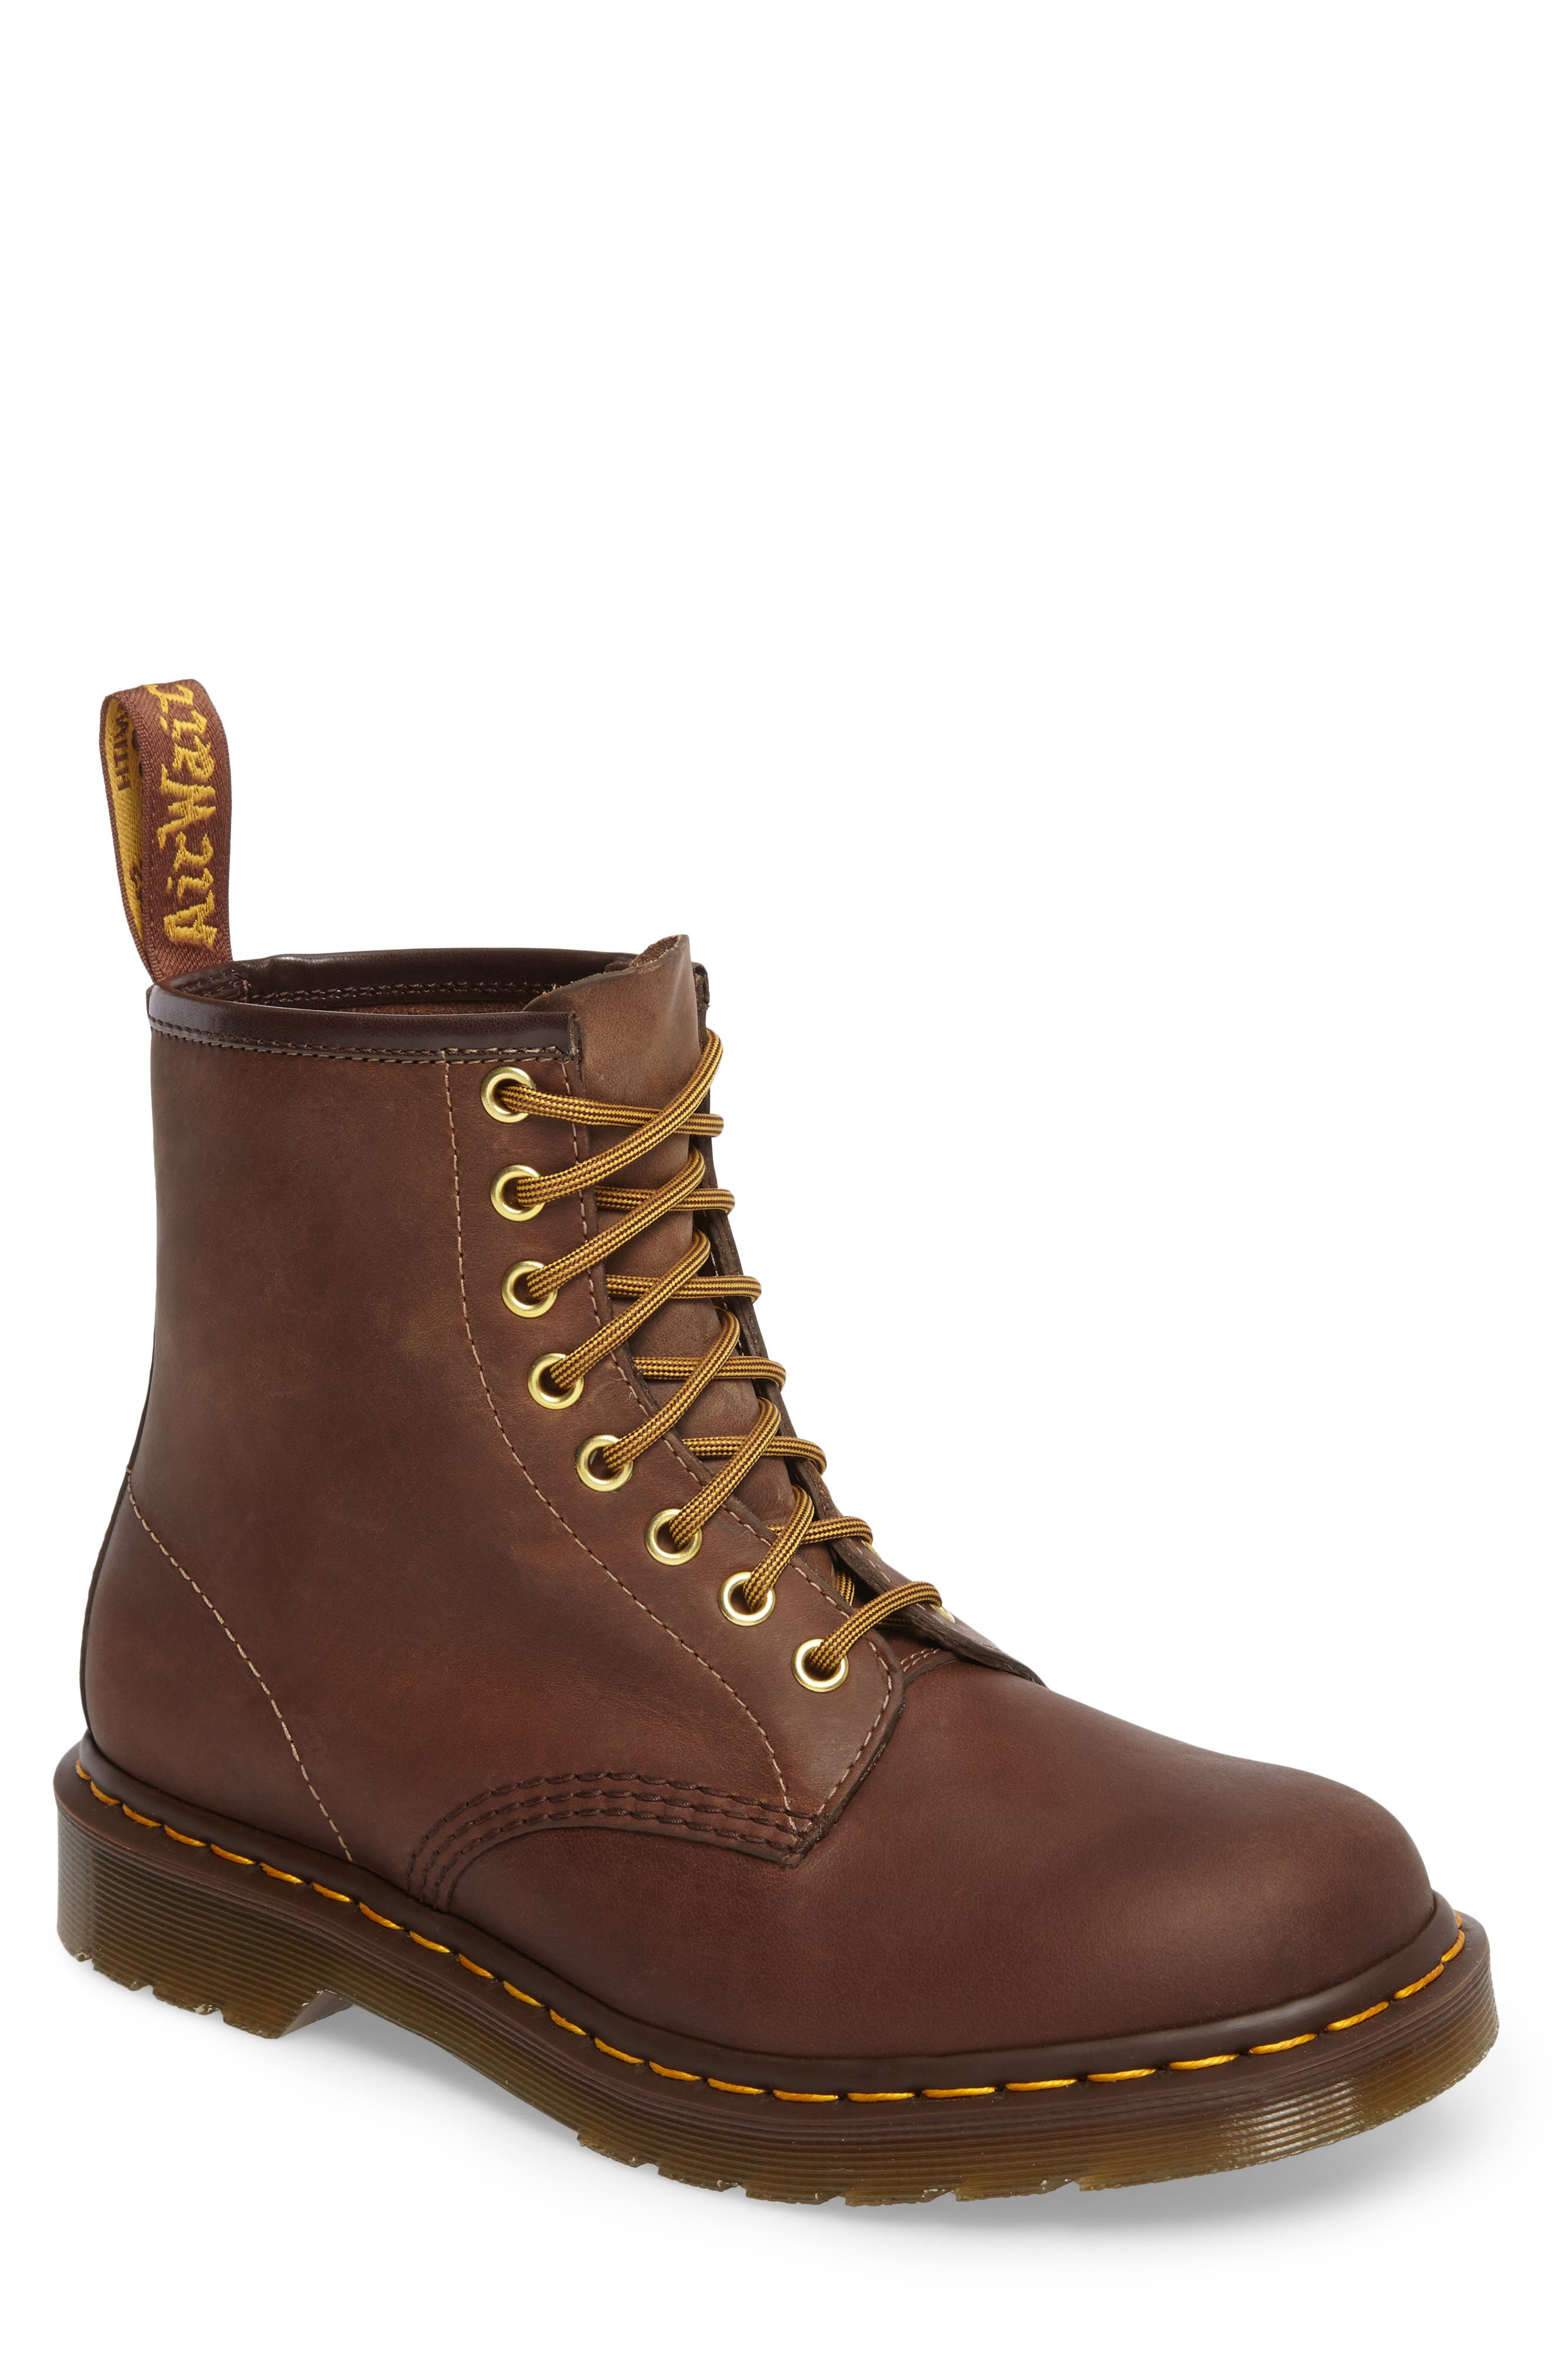 8d124f1ecdc5 Men s Dr. Martens Boots